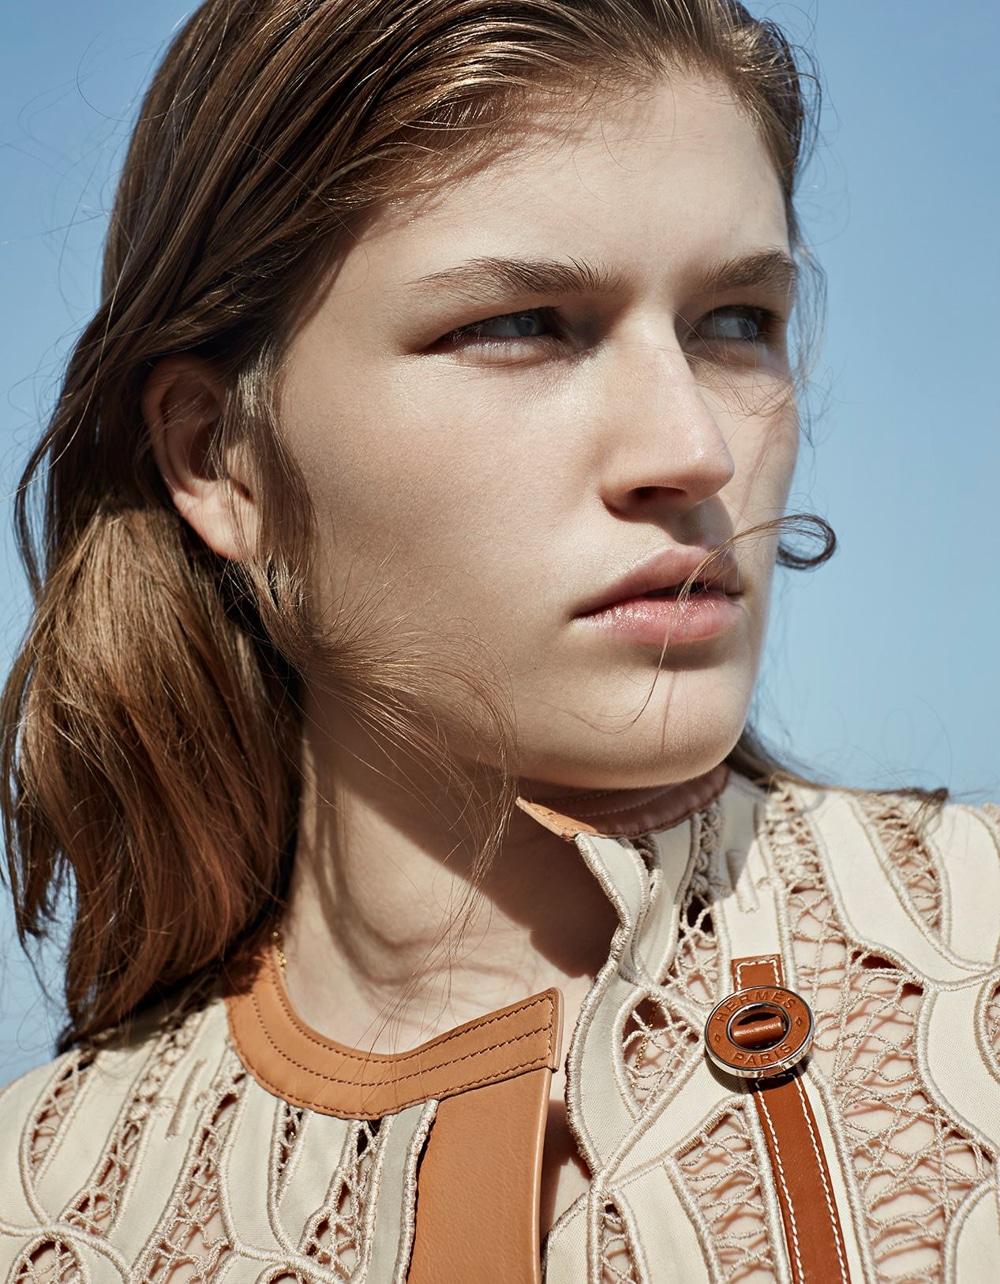 Vogue-Poland-Molly-Smith-Agata-Pospieszynska-13.jpg